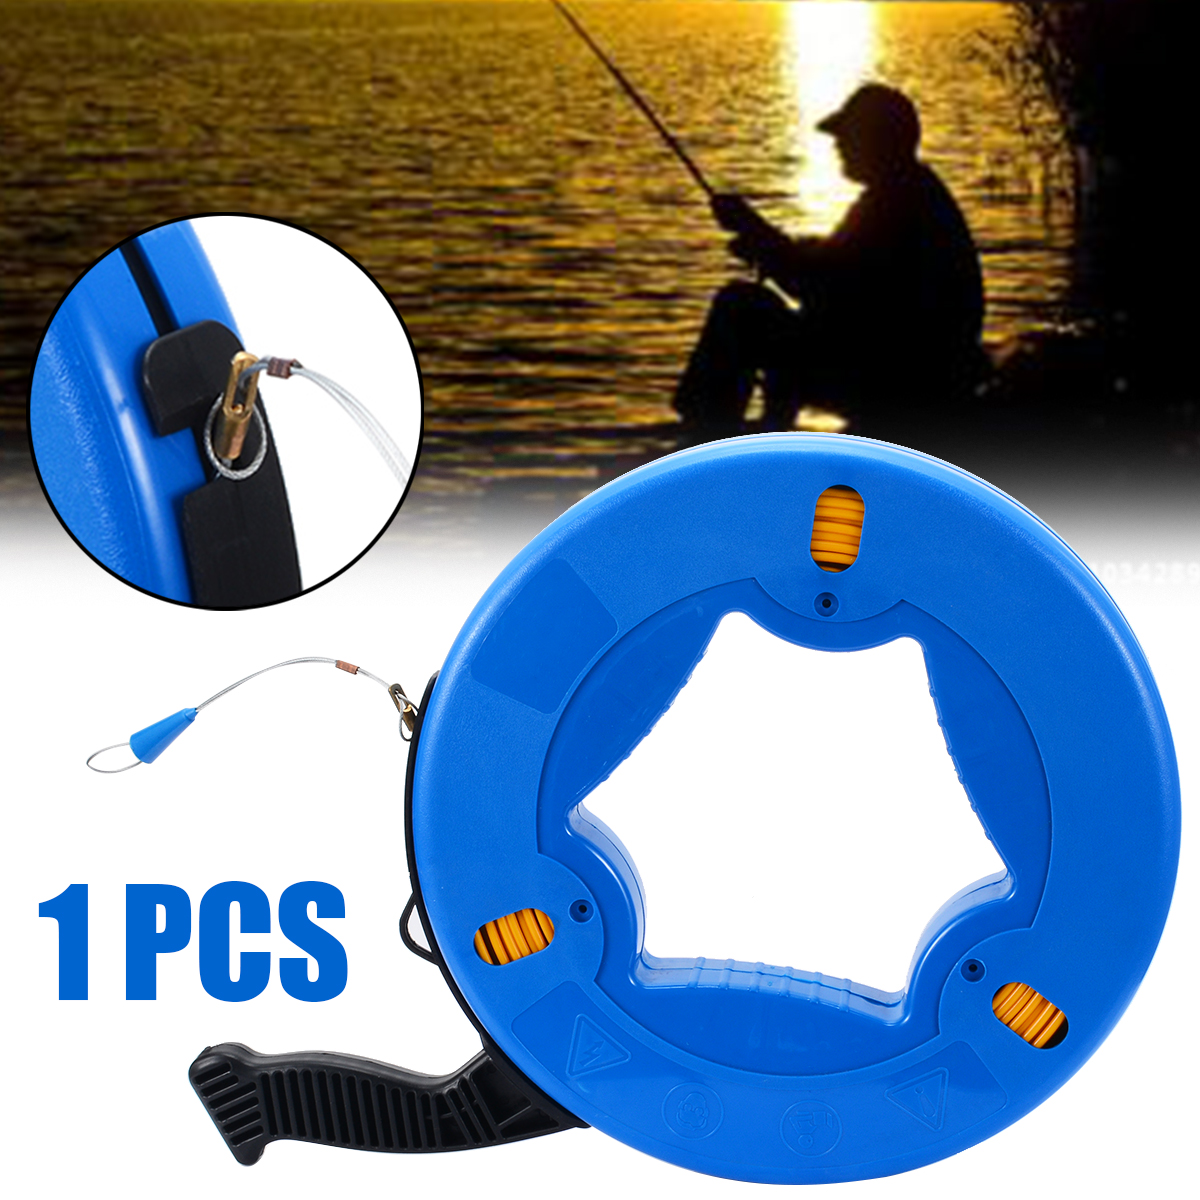 Portable 45 Meter Length Non conductive Fiberglass Fish Tape Fishing Tool Reel Puller Conduit Duct Rodder